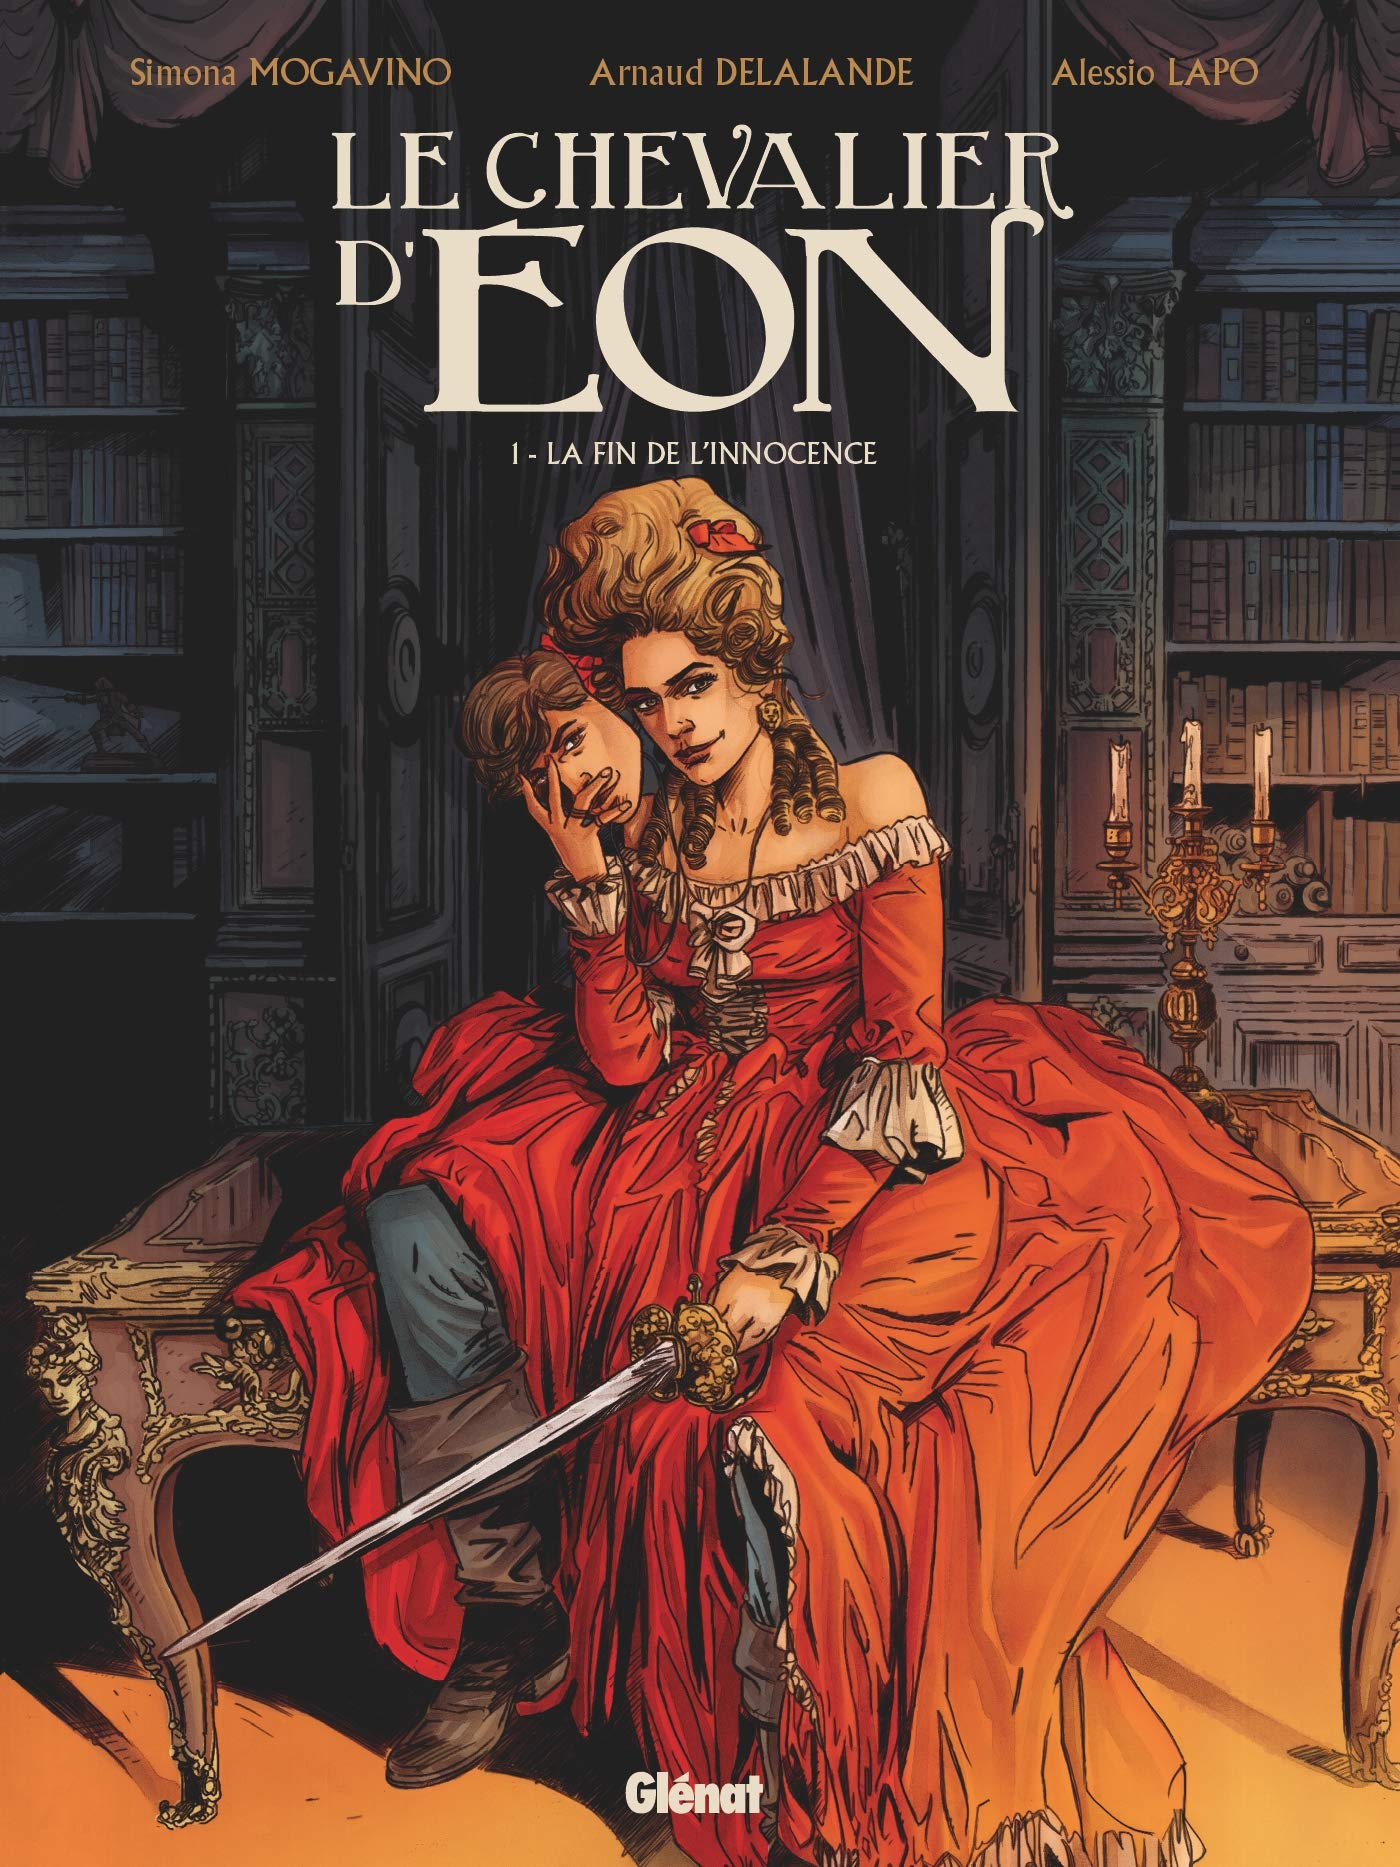 Le chevalier d'Eon (Lapo) 1 - La fin de l'innocence